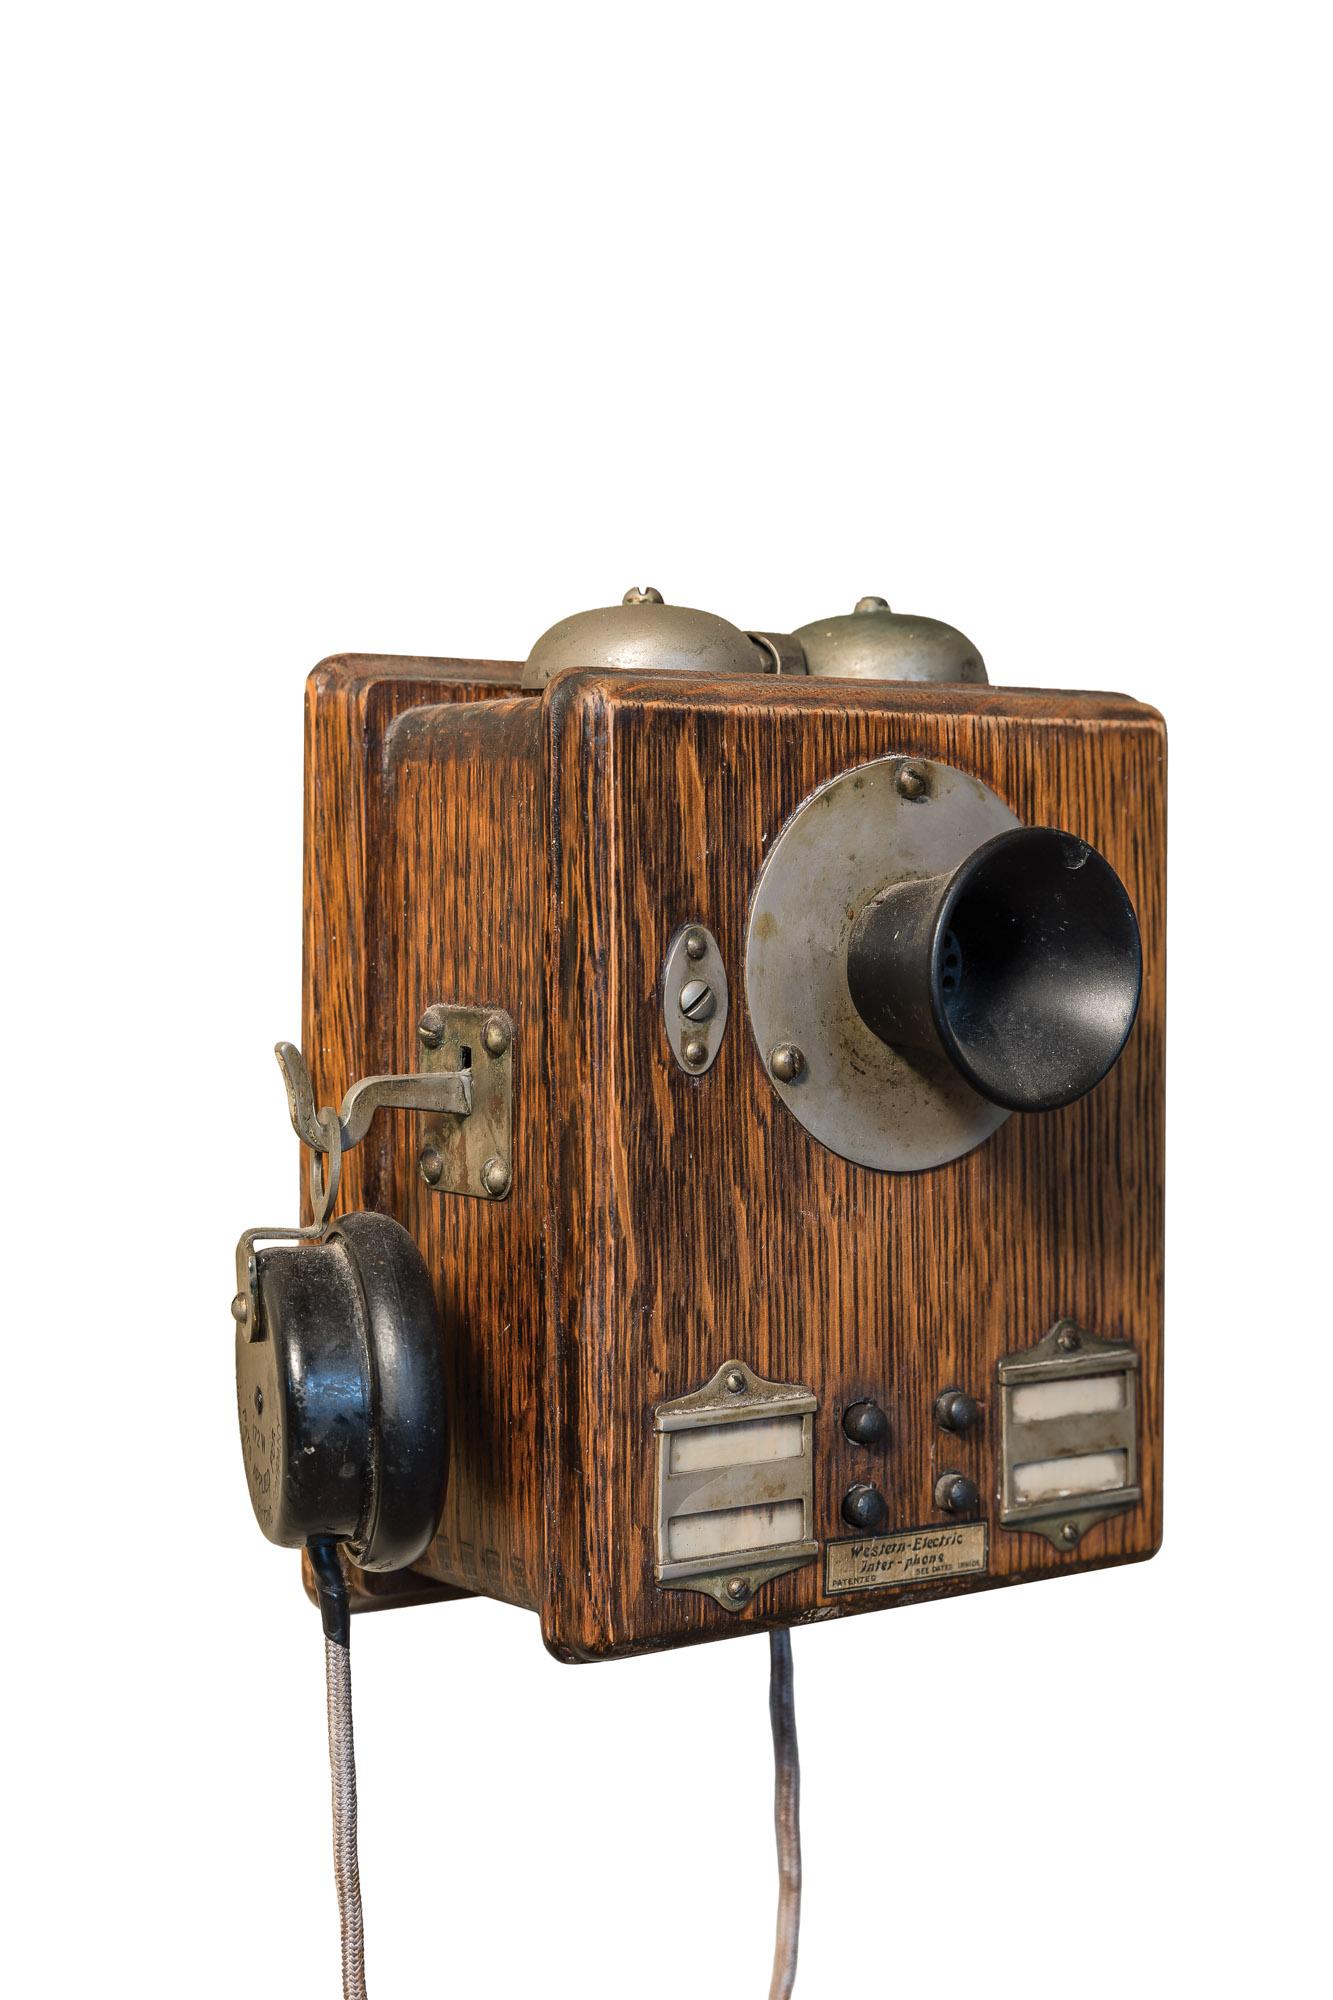 kit call box 20191029_ohj_rwhc_076_s